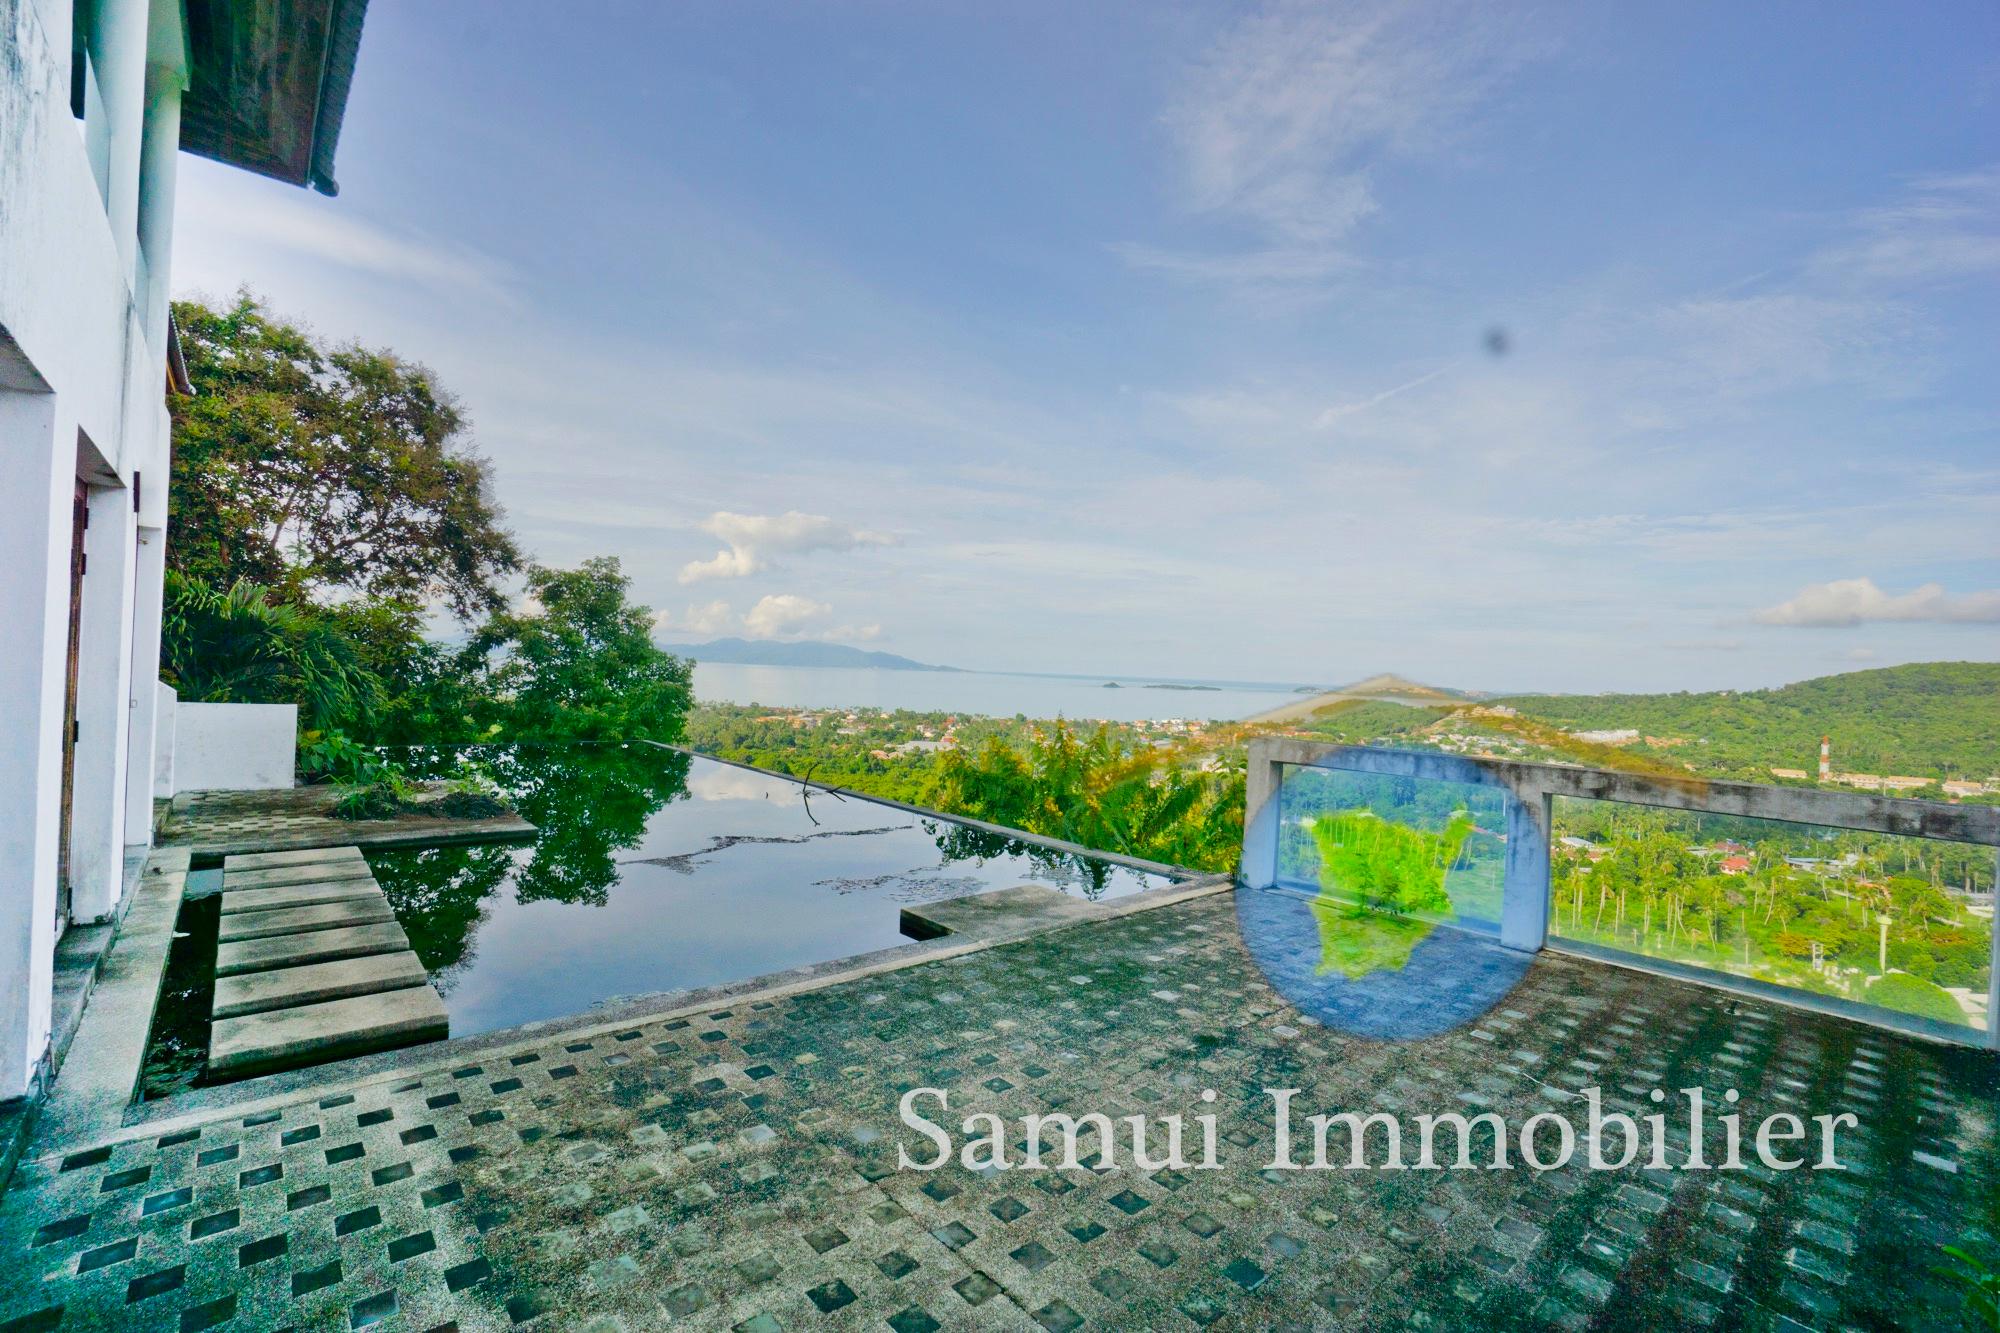 Villa for sale - 4 bedrooms - sea view - Bophut